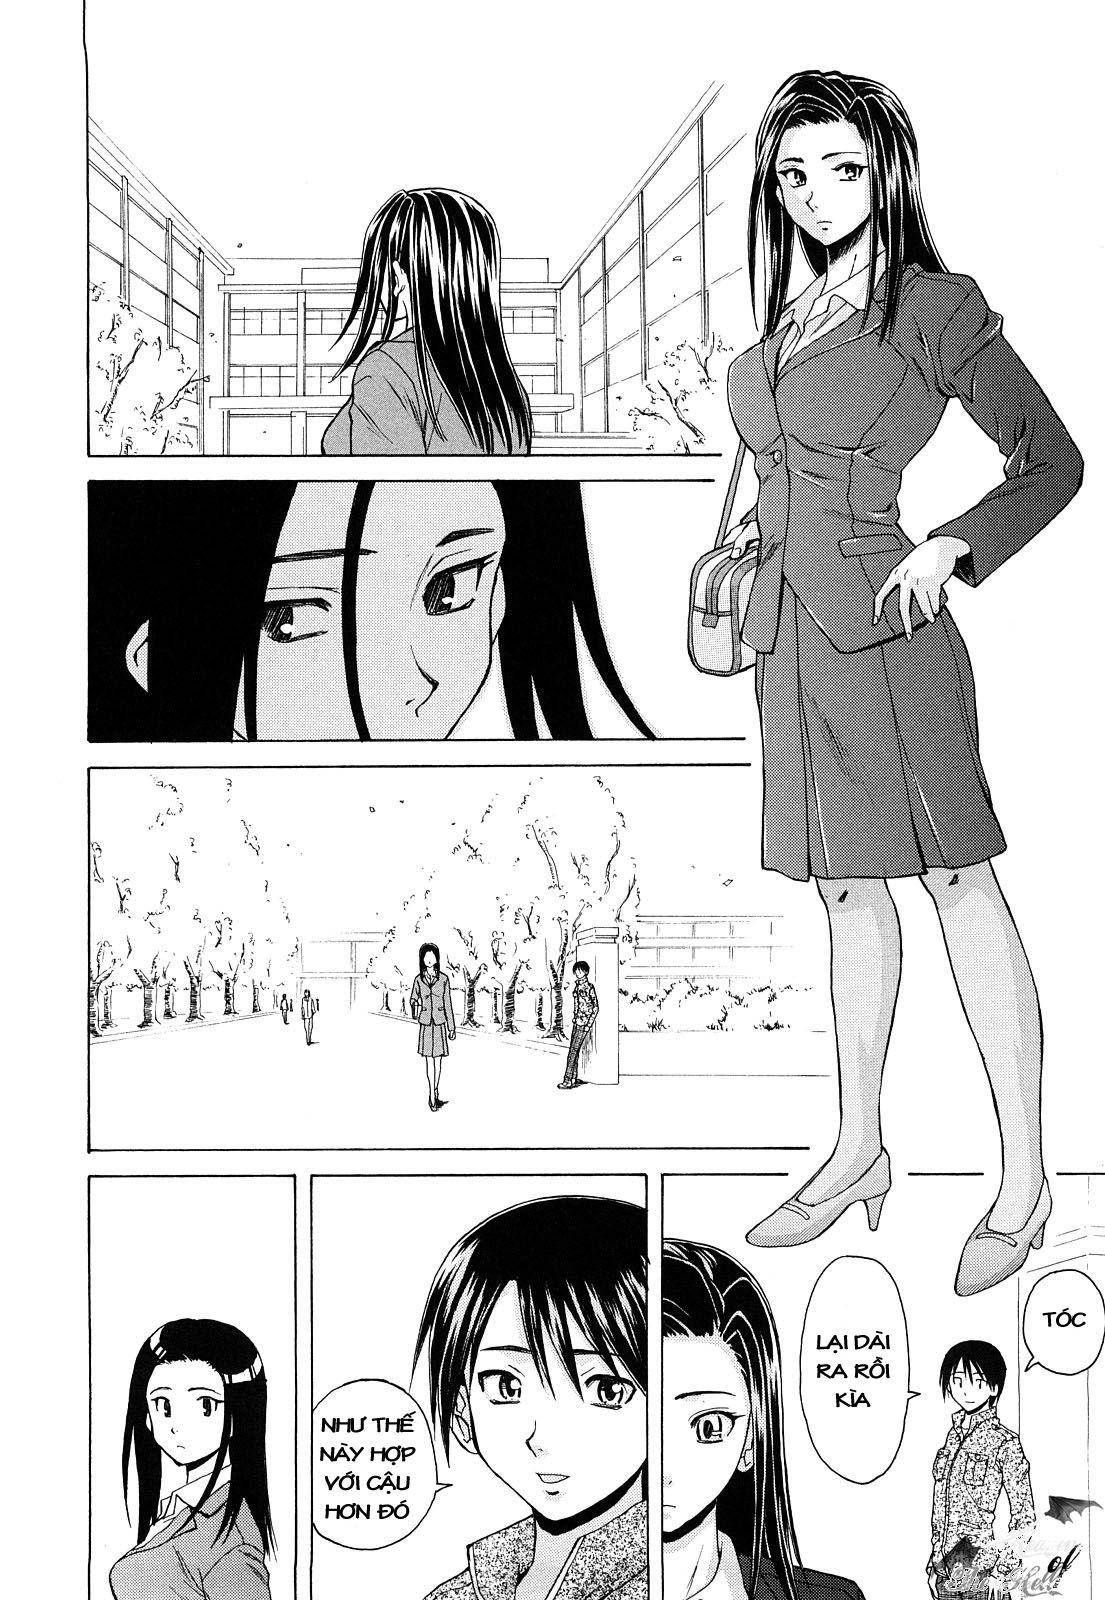 TruyenHay.Com - Ảnh 36 - Setsunai Omoi Chapter 4